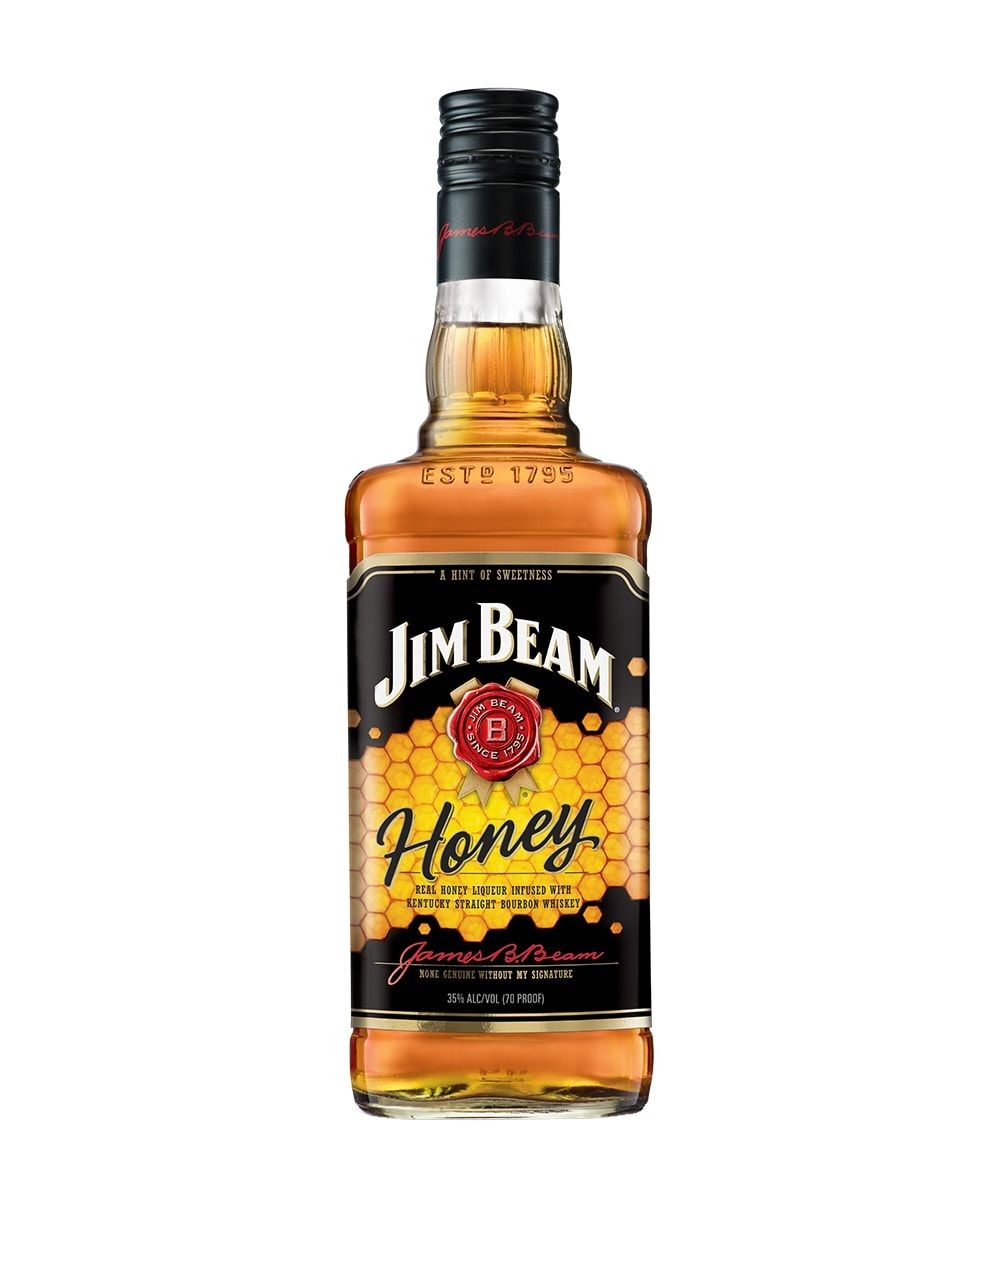 jim beam honey bourbon whiskey buy online or send as a gift